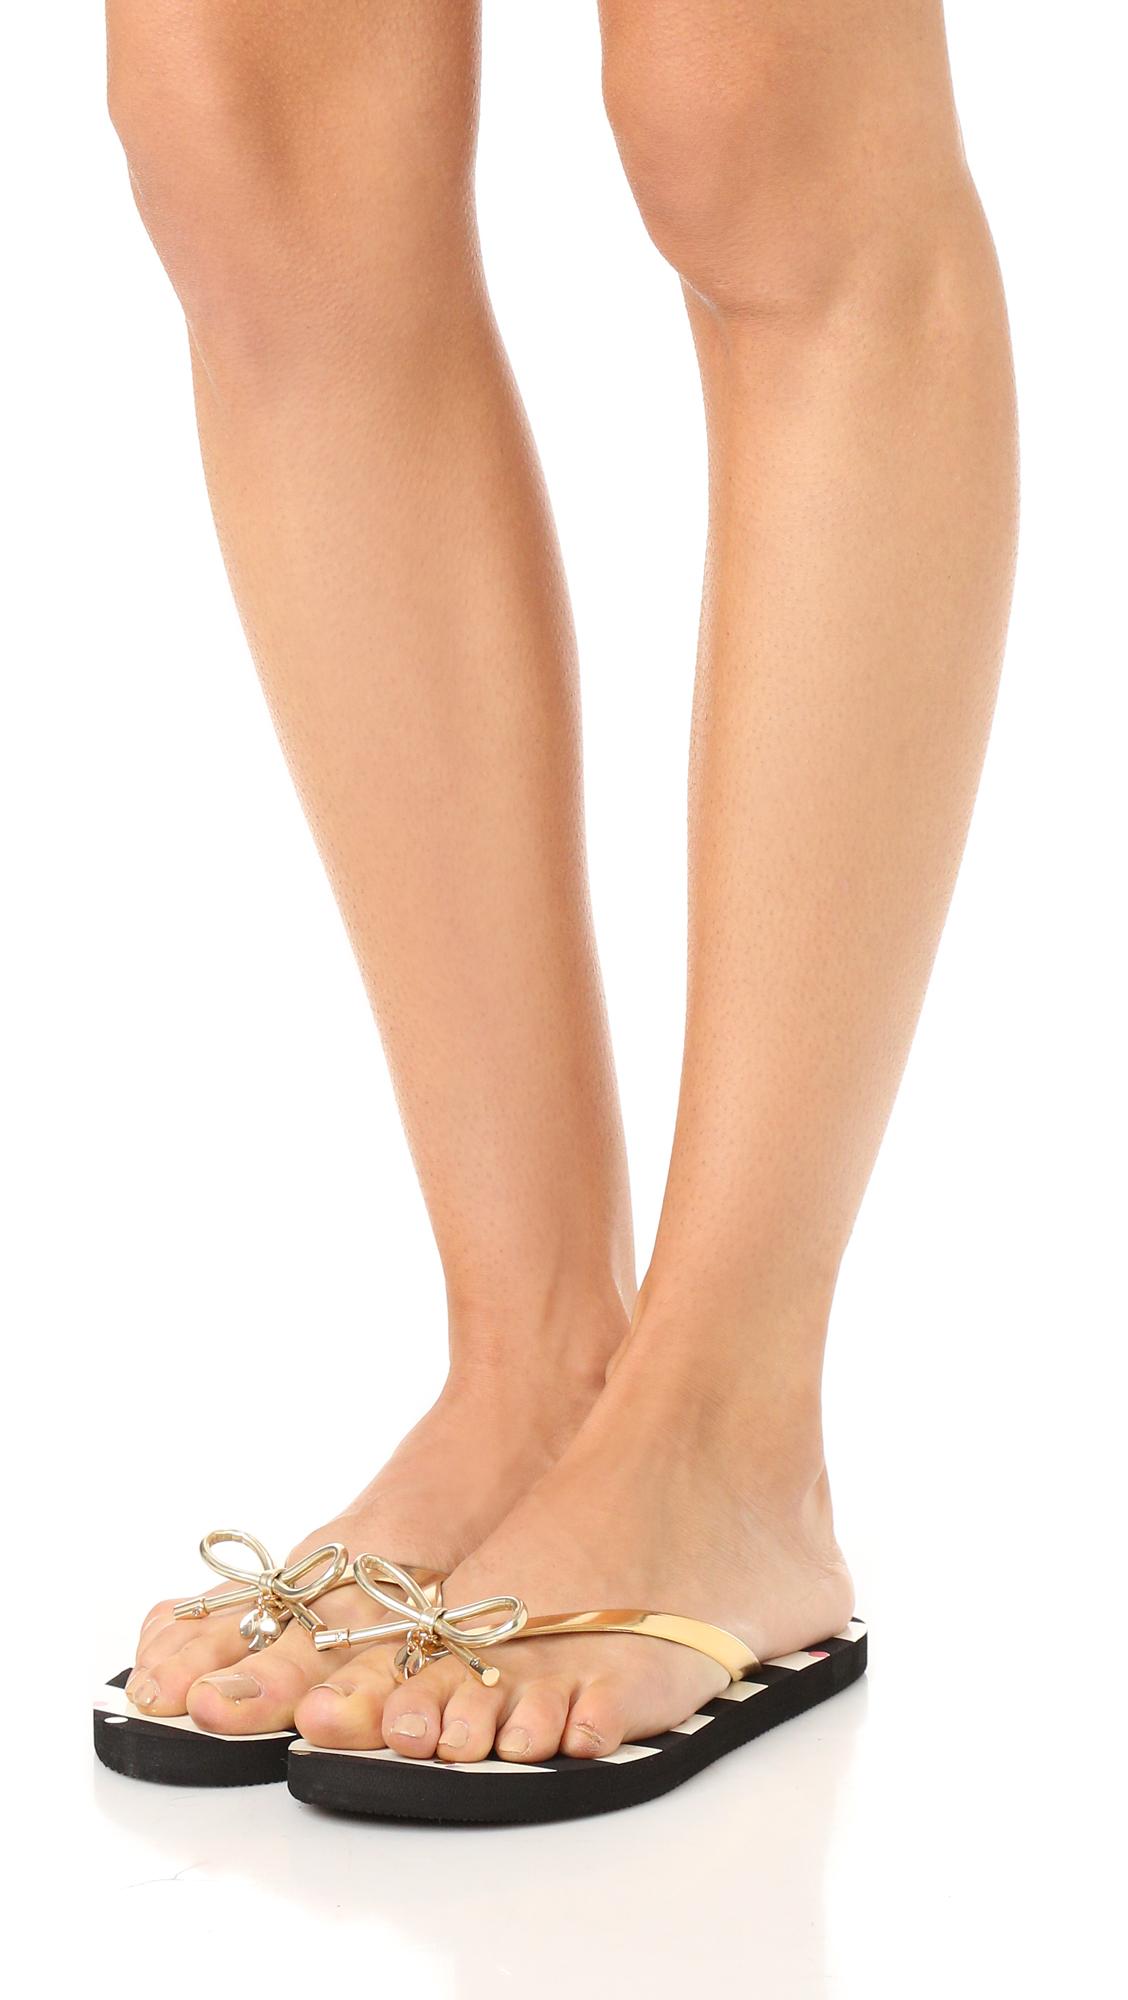 1a1e7d8ac Kate Spade New York Nova Flip Flops